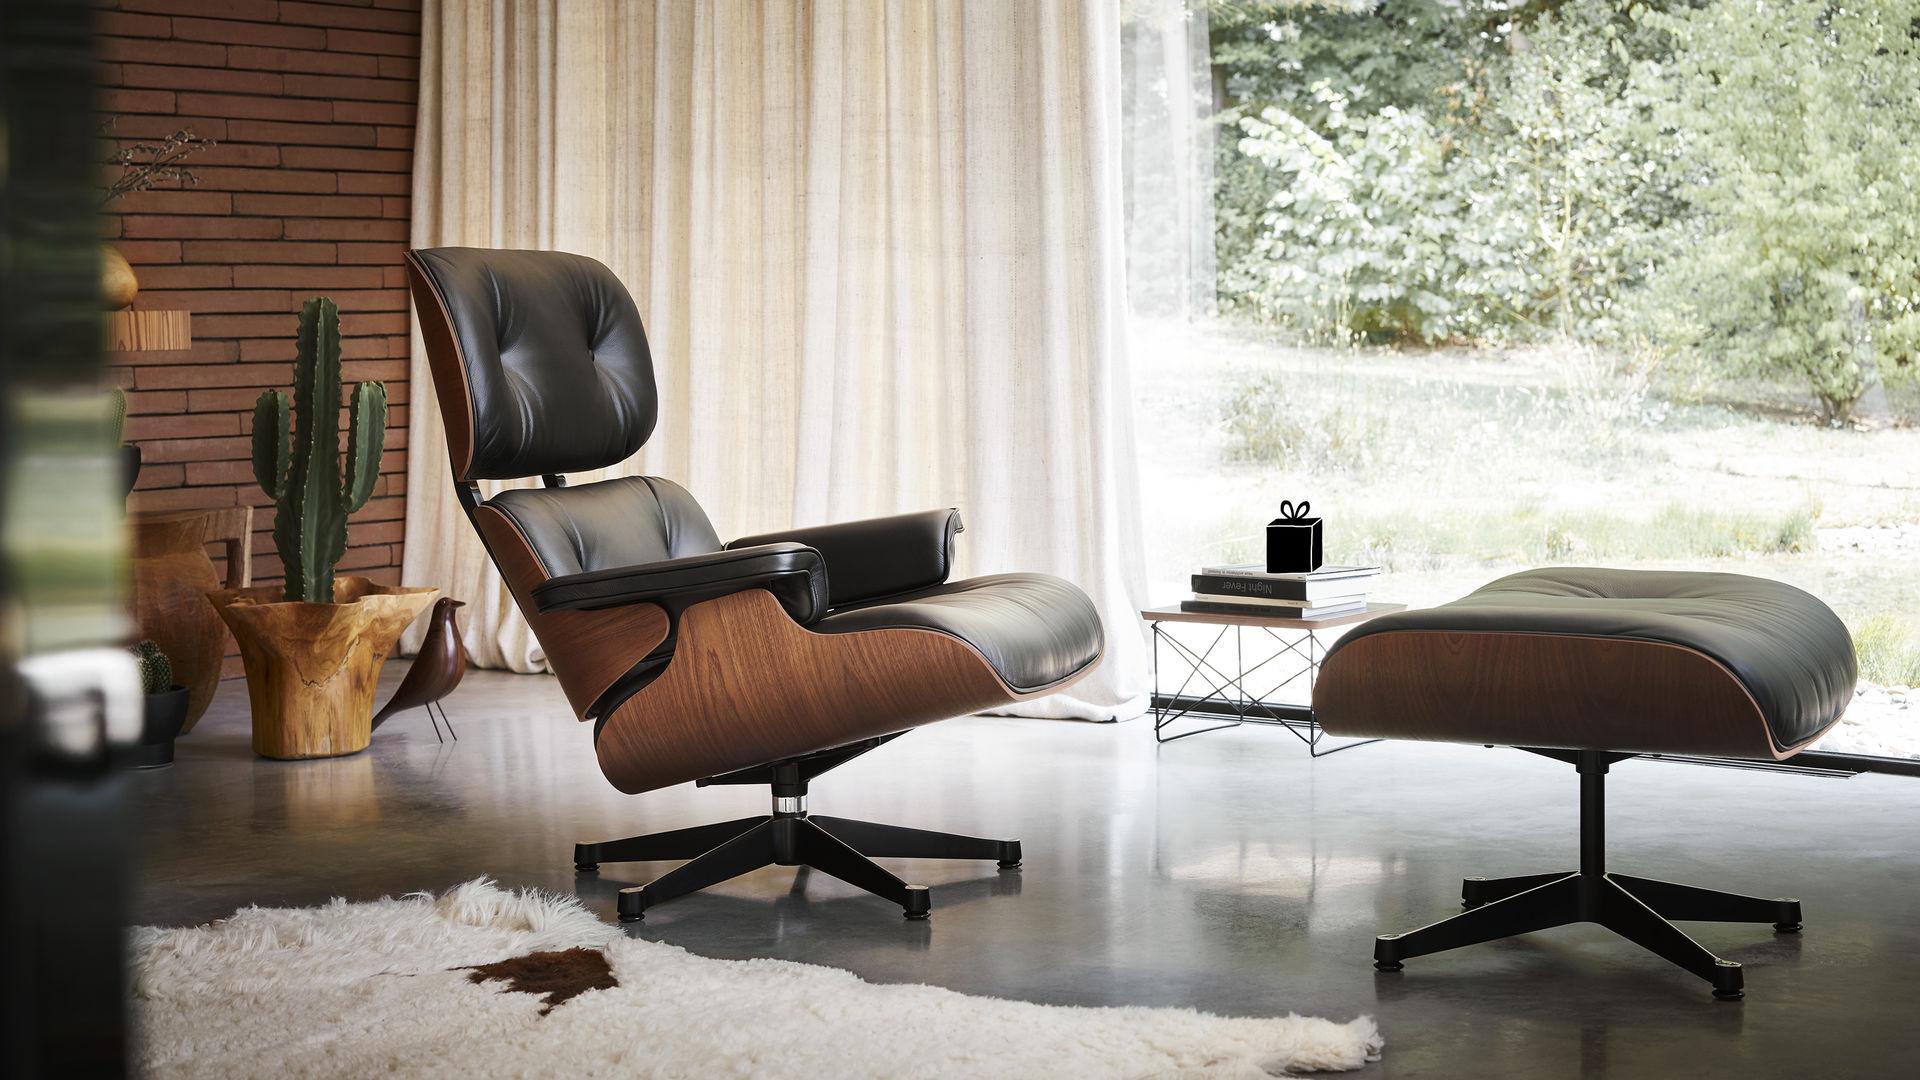 Eames Lounge Chair and Ottoman 1.jpg